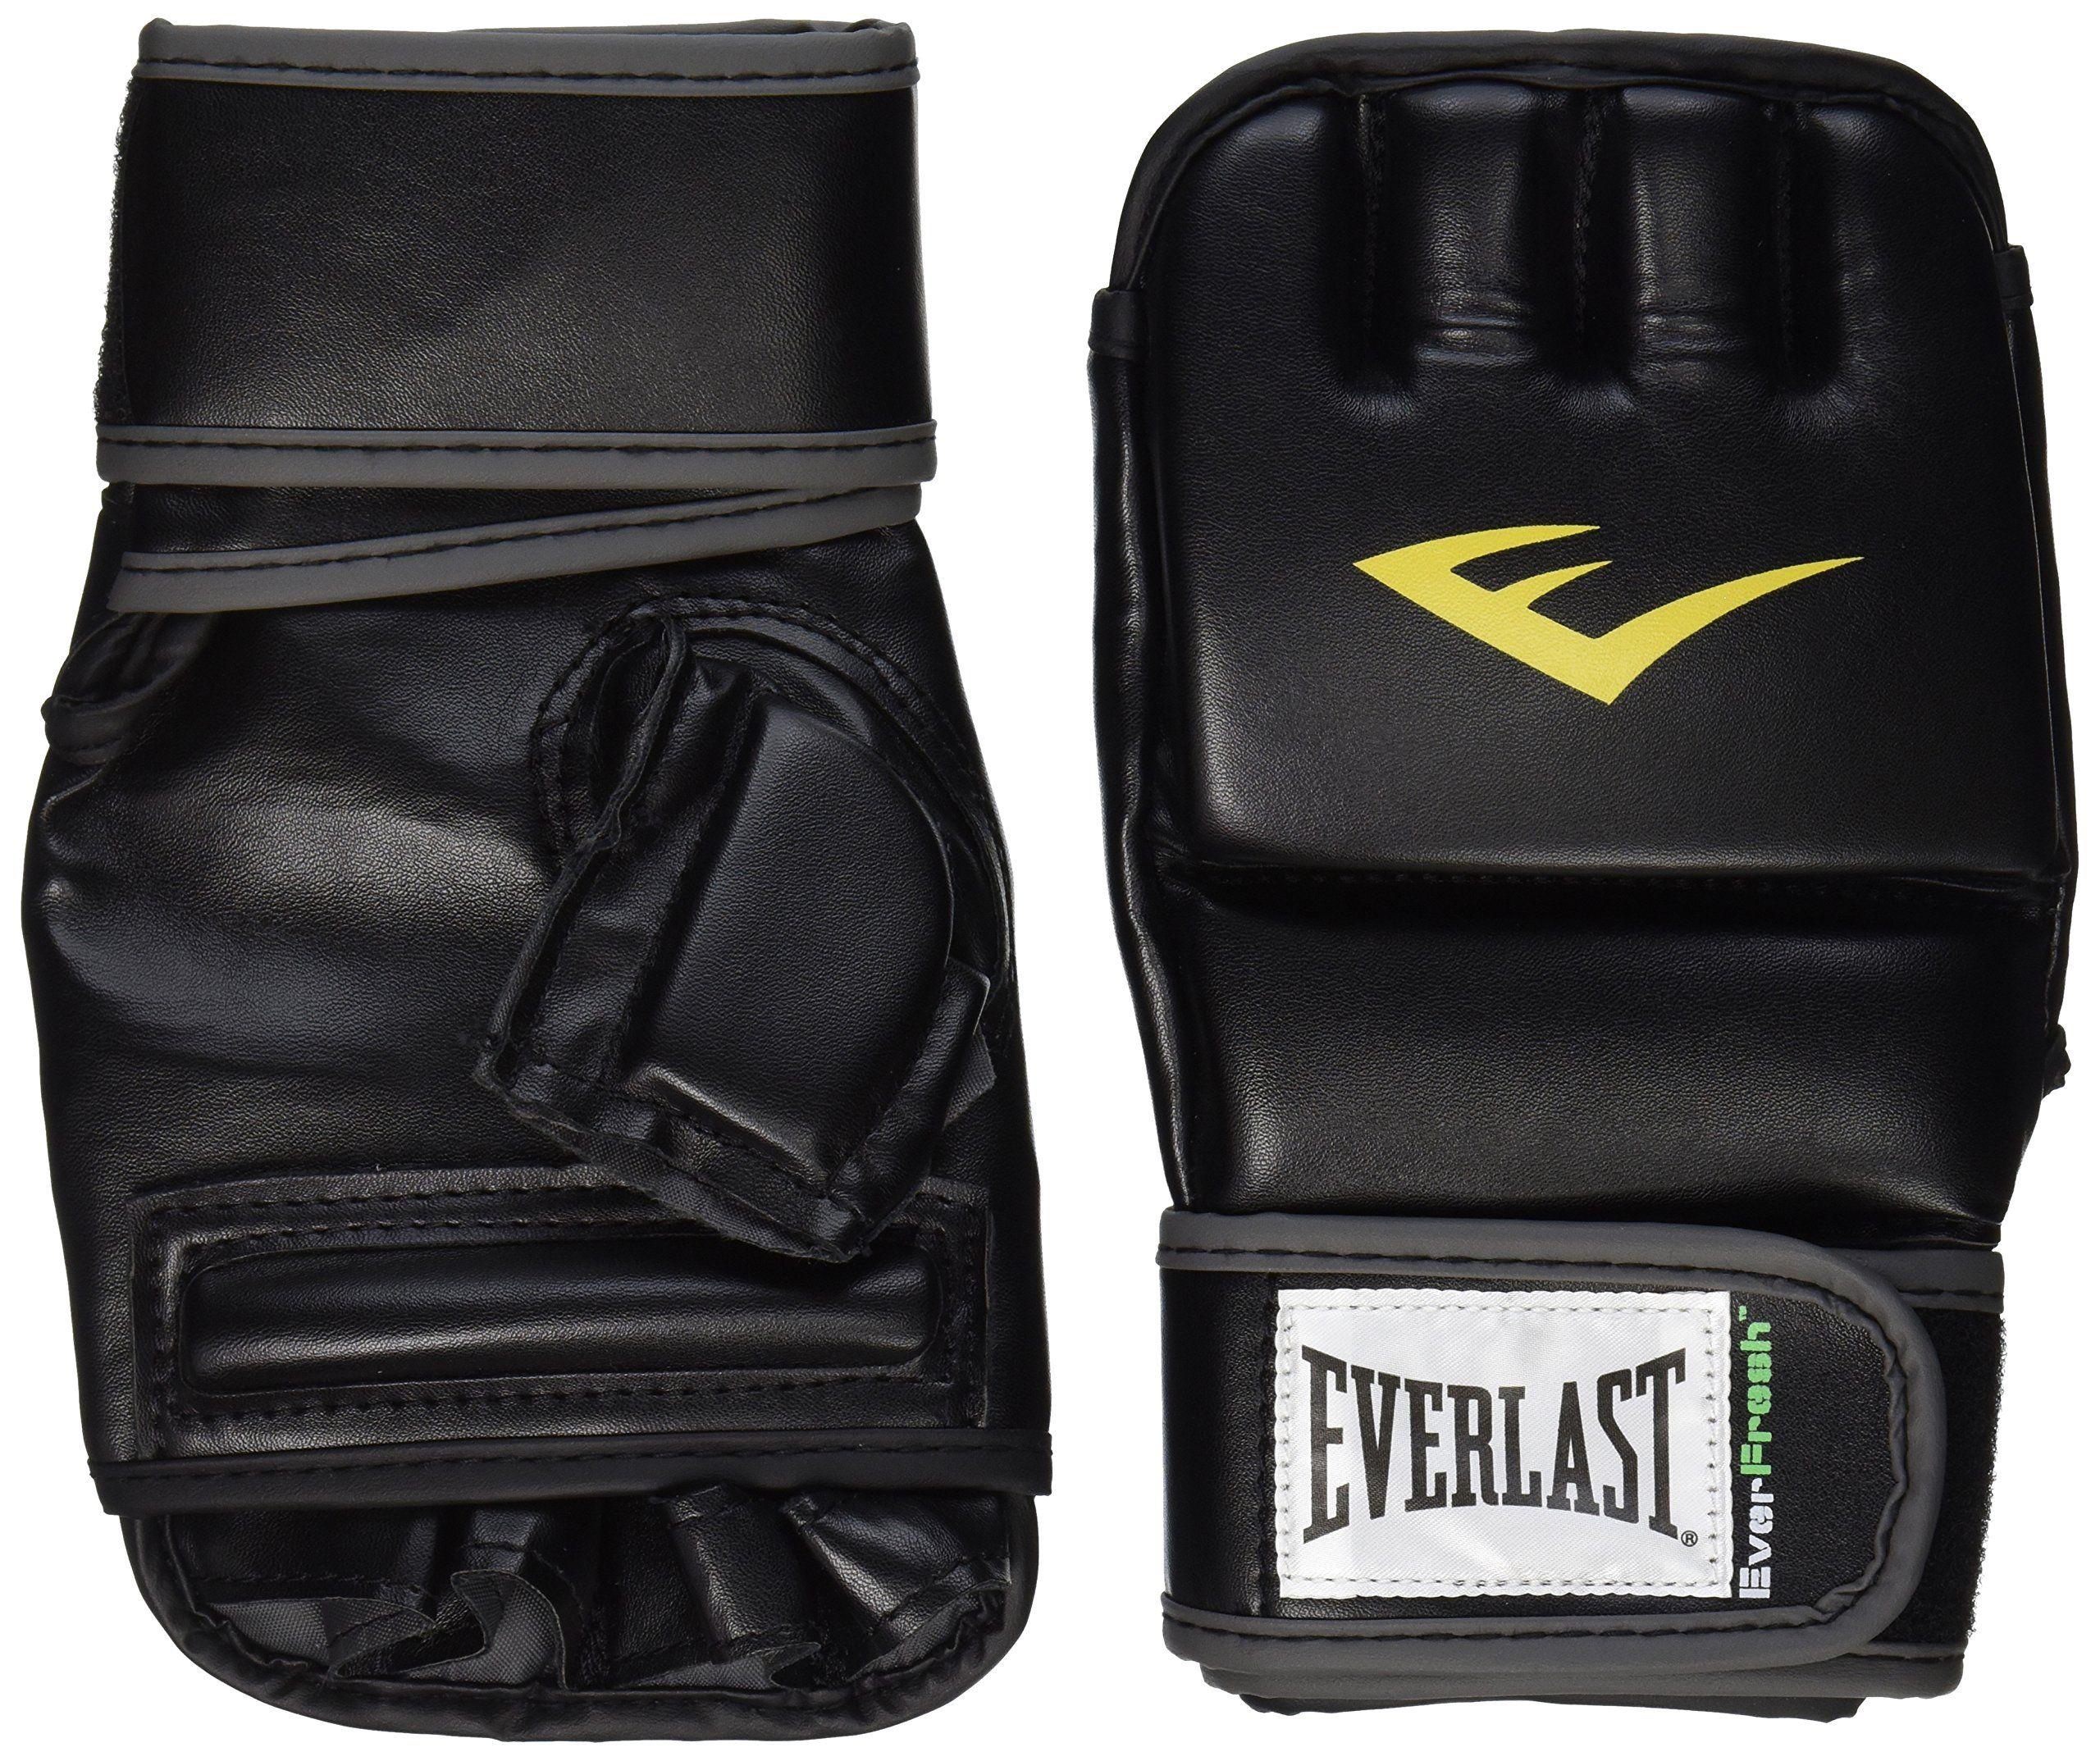 Speed Punching Bag Workout Trainer Kids Boxing Kick Timer Hangs Door Brand New